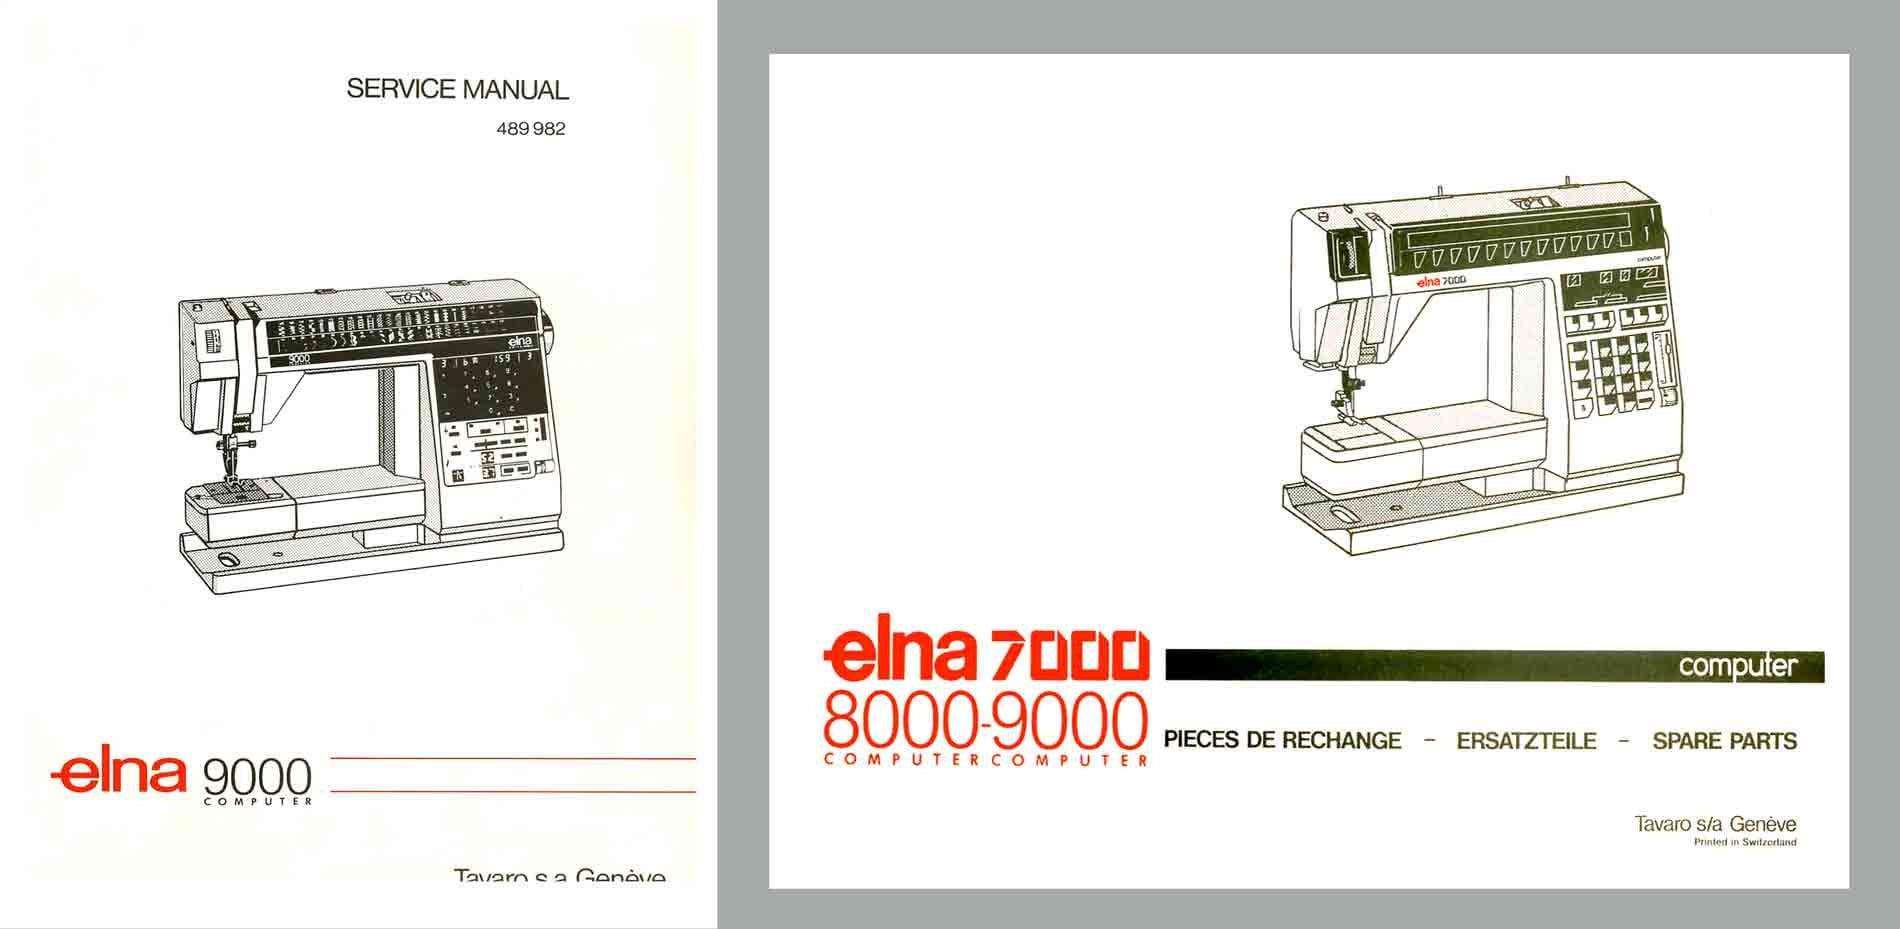 Elna 9000 Diva Service Manual And Parts Schematics Book Etsy Computer Diagram Basic Of A 50